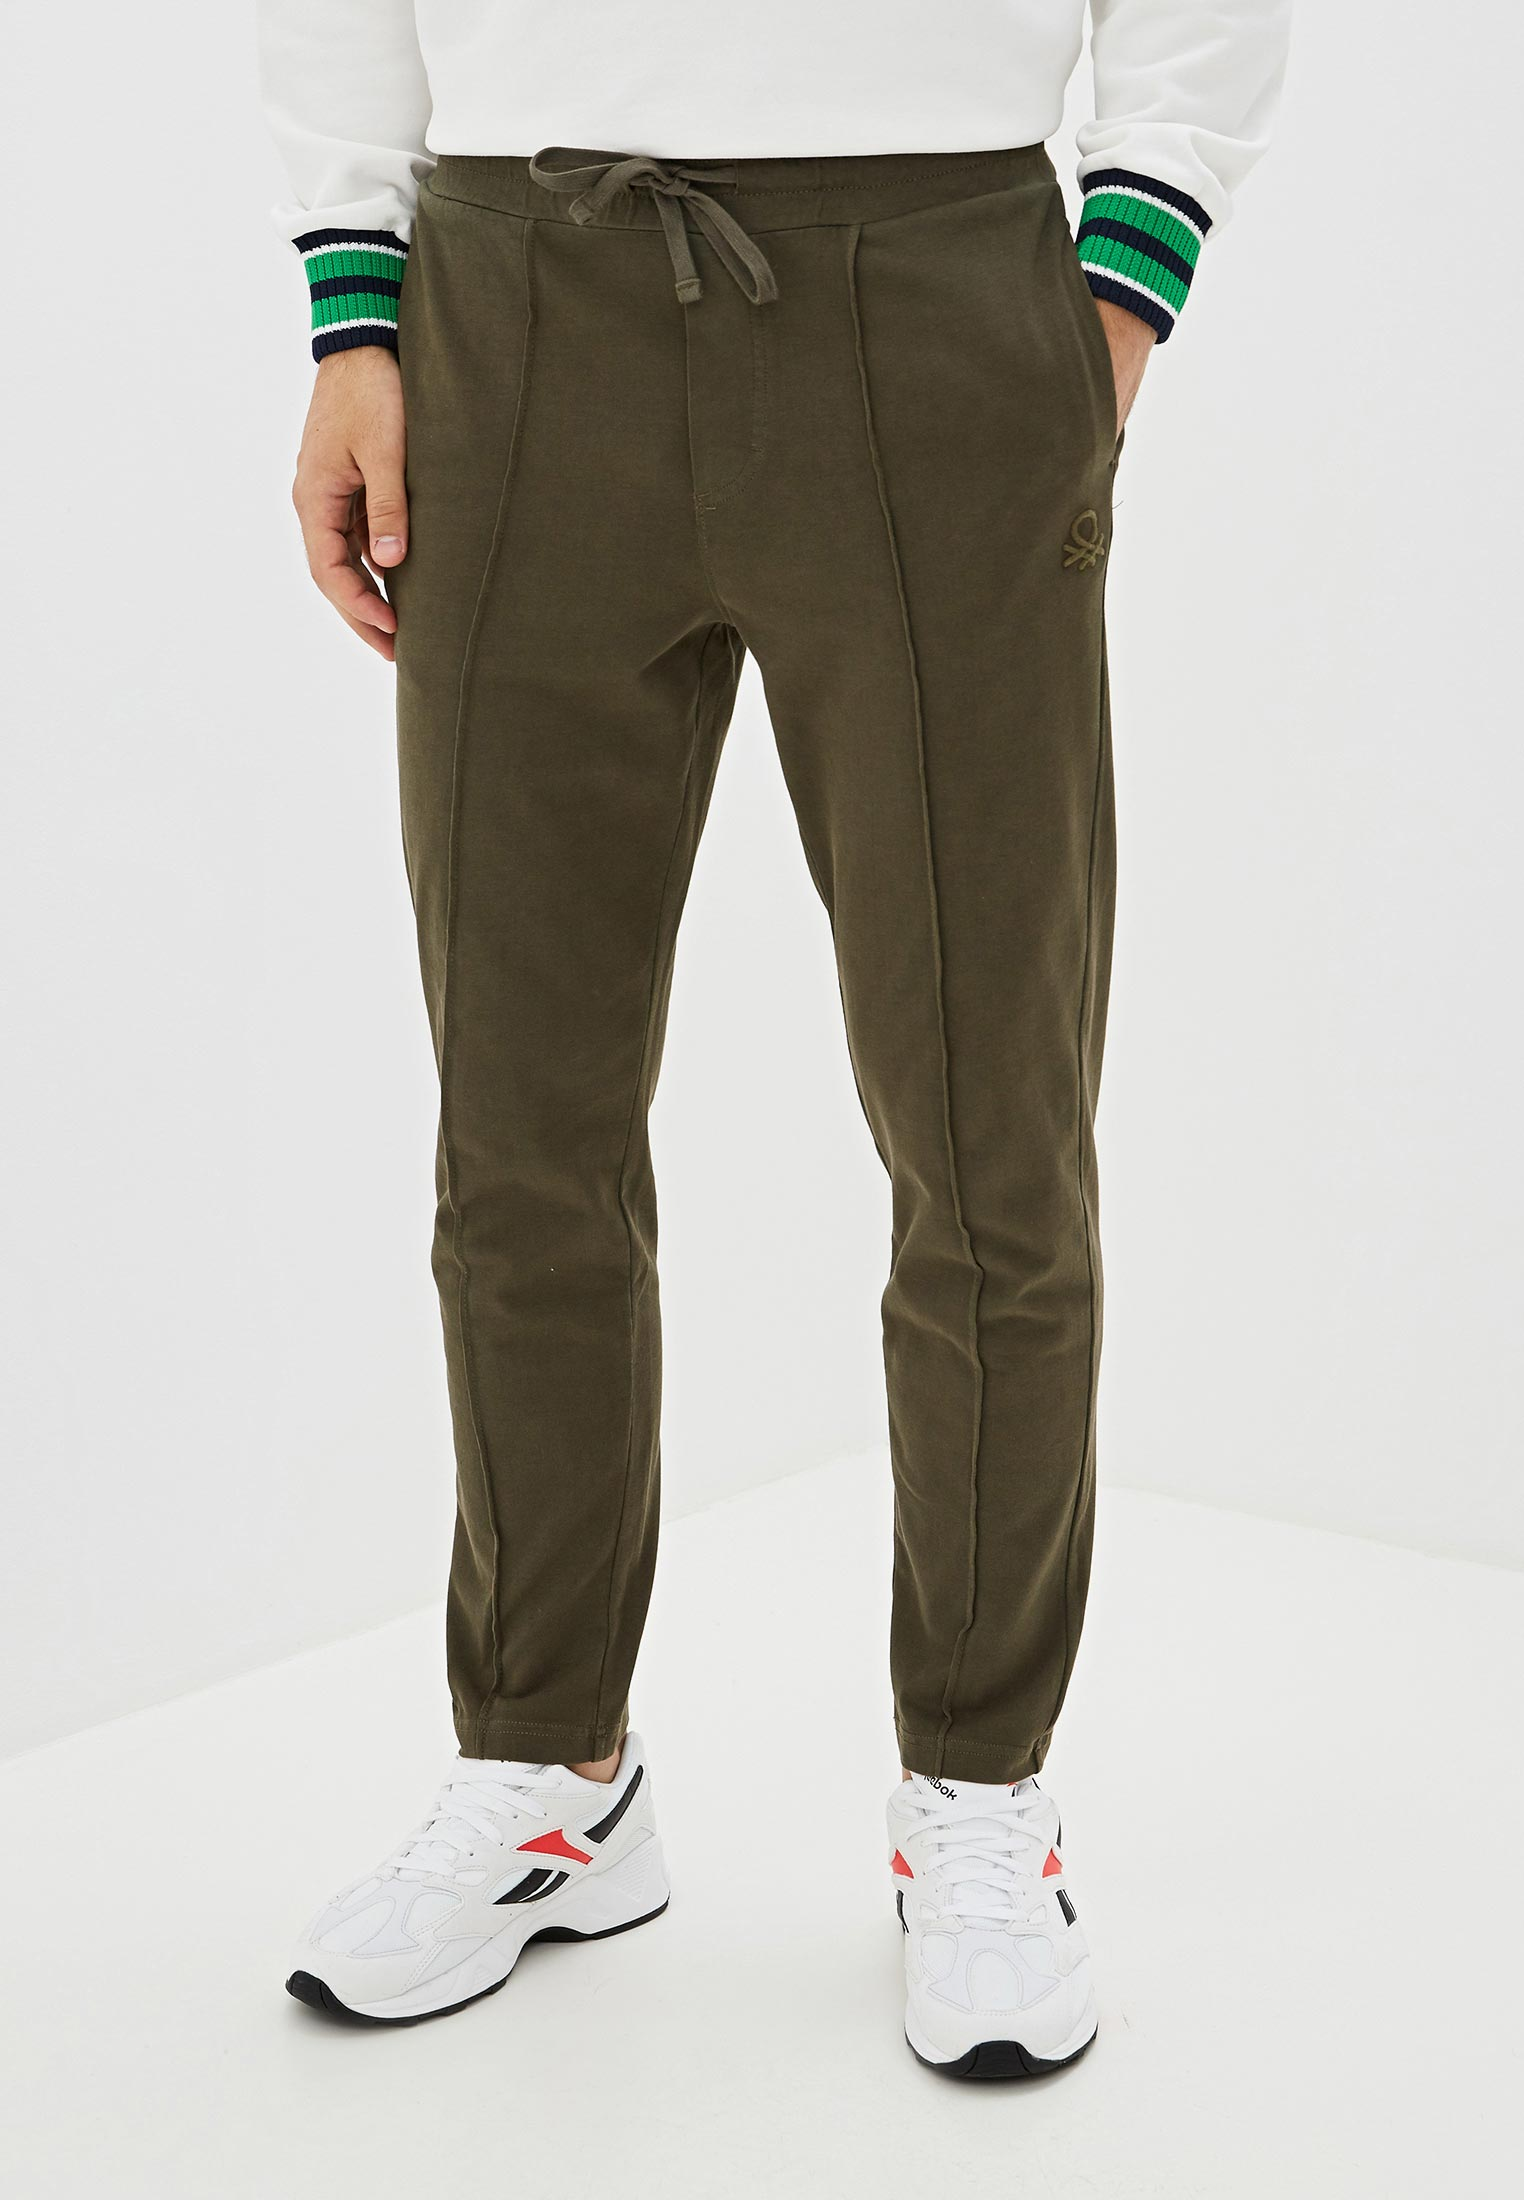 Мужские спортивные брюки United Colors of Benetton (Юнайтед Колорс оф Бенеттон) 3DQWP0436: изображение 1